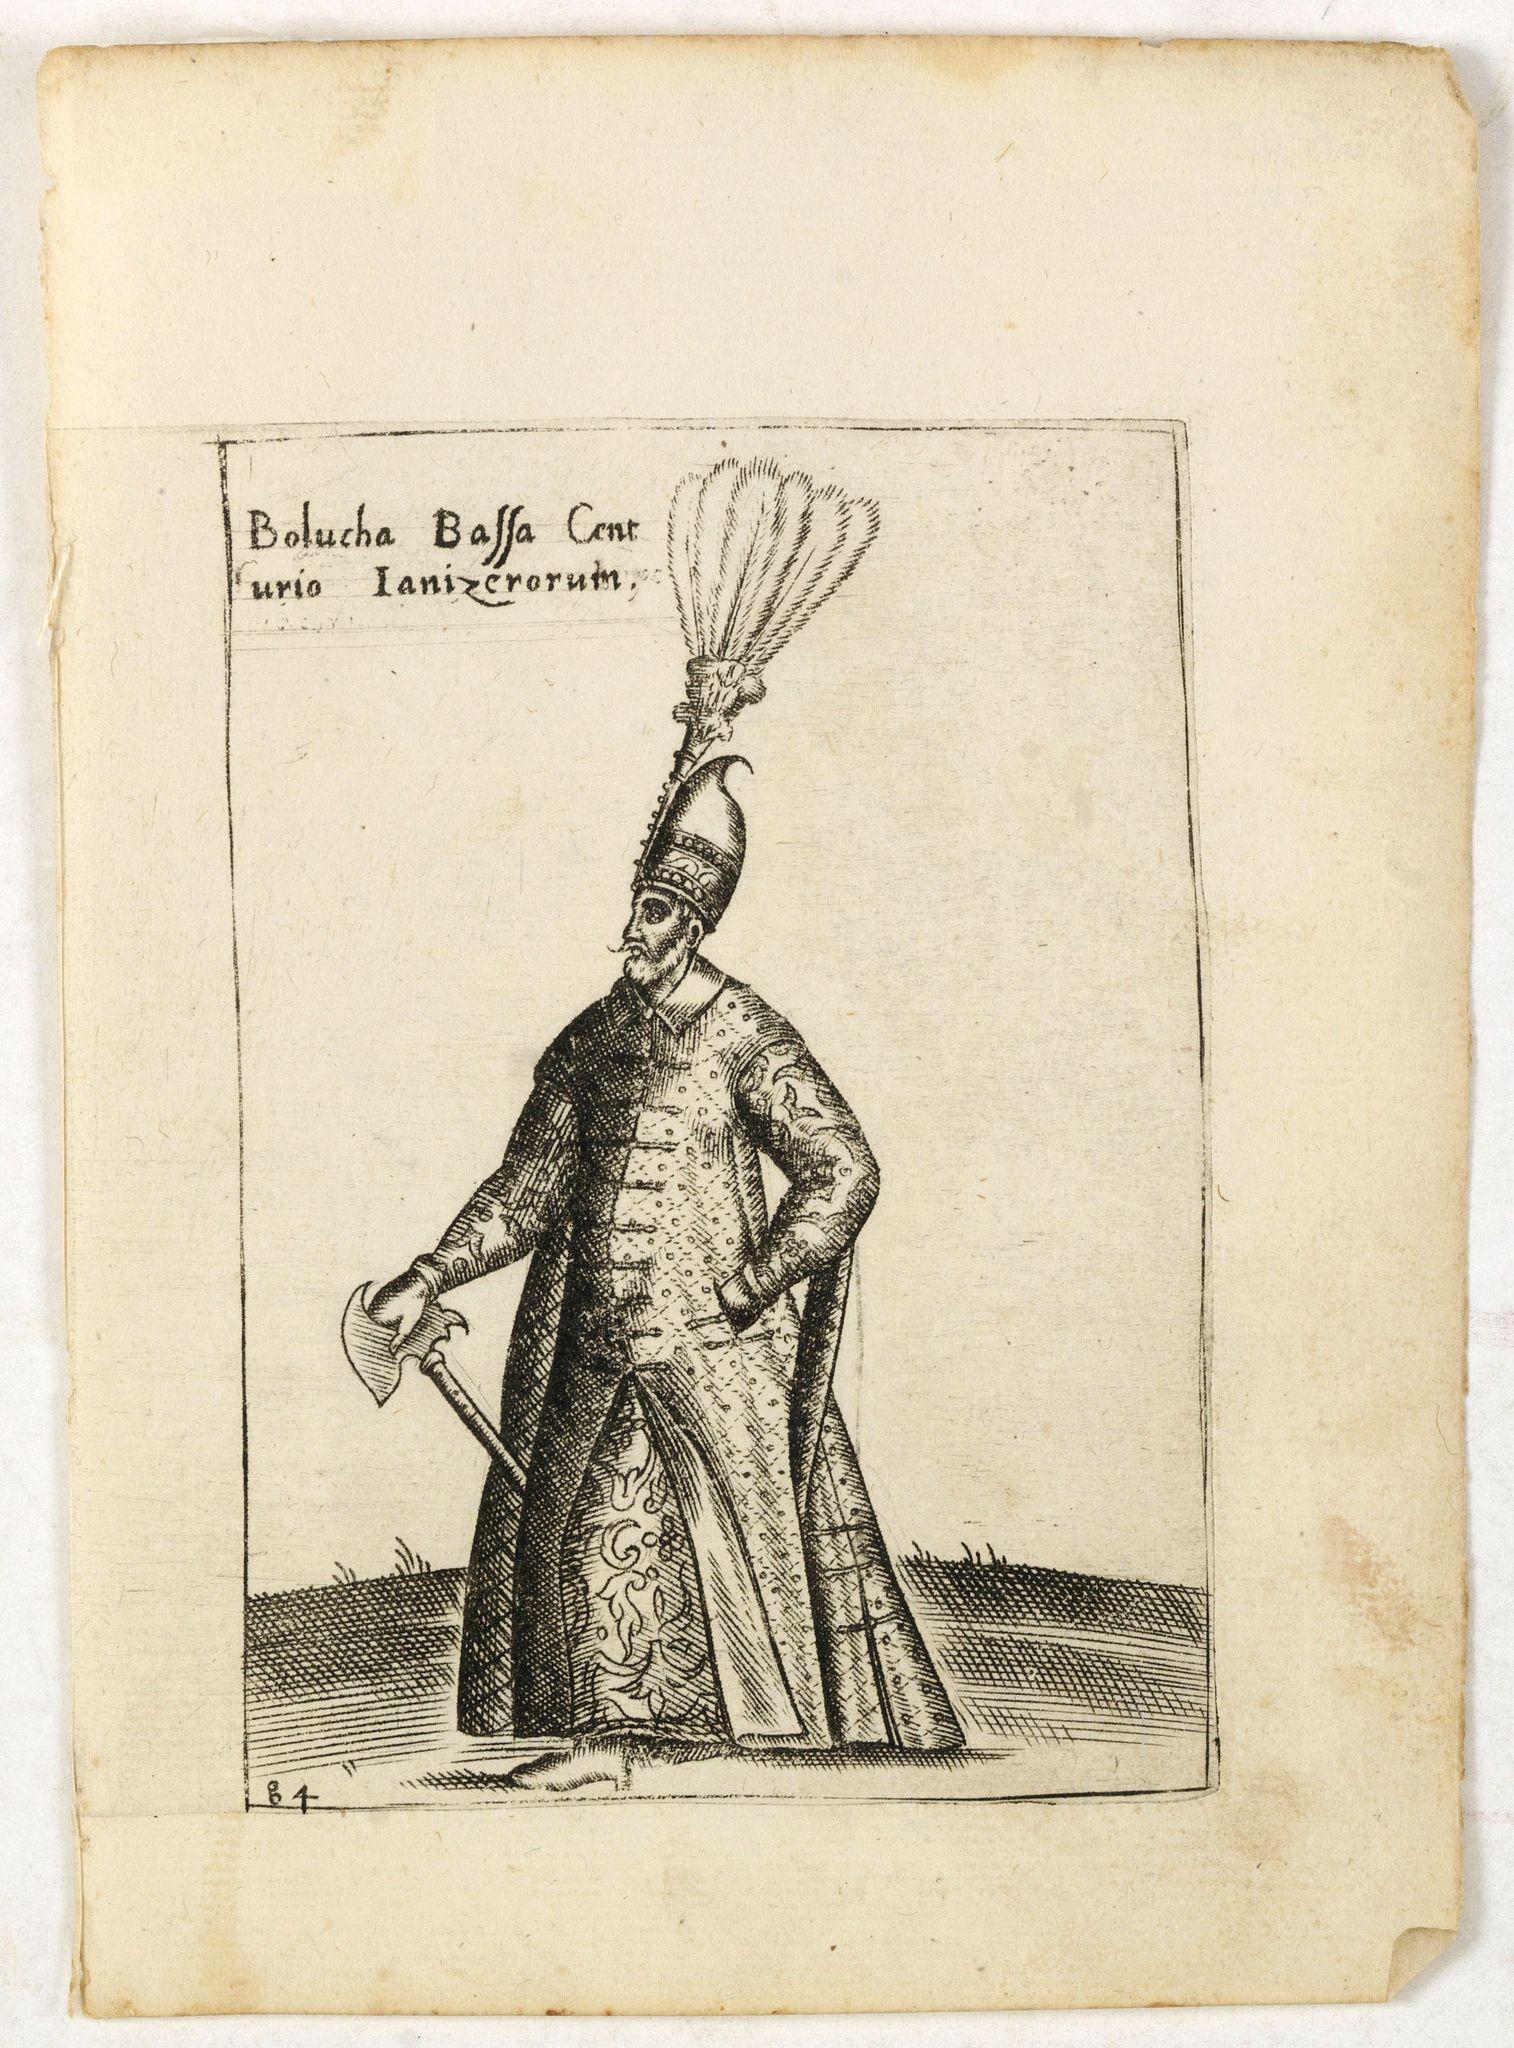 BERTELLI, P. -  Bolucha Bassa Centurio Ianizerorum.